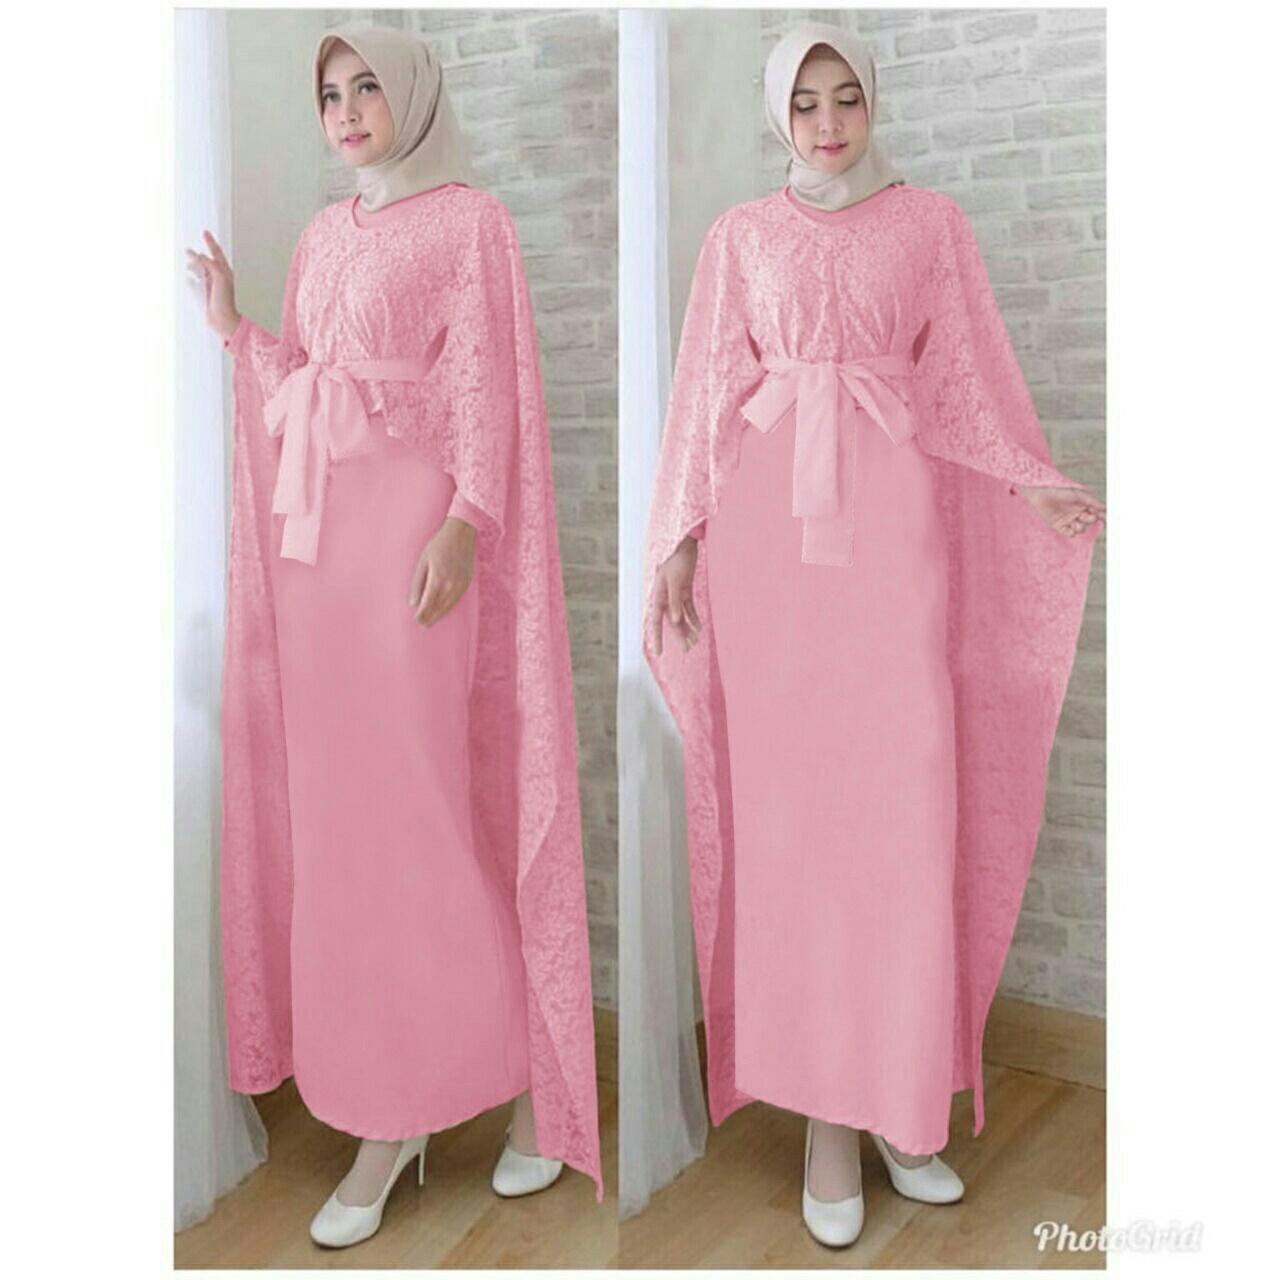 Cek Harga Baru Honeyclothing Dress Muslim Wanita Emmi Baju Gamis Riccel Maxi Hijab